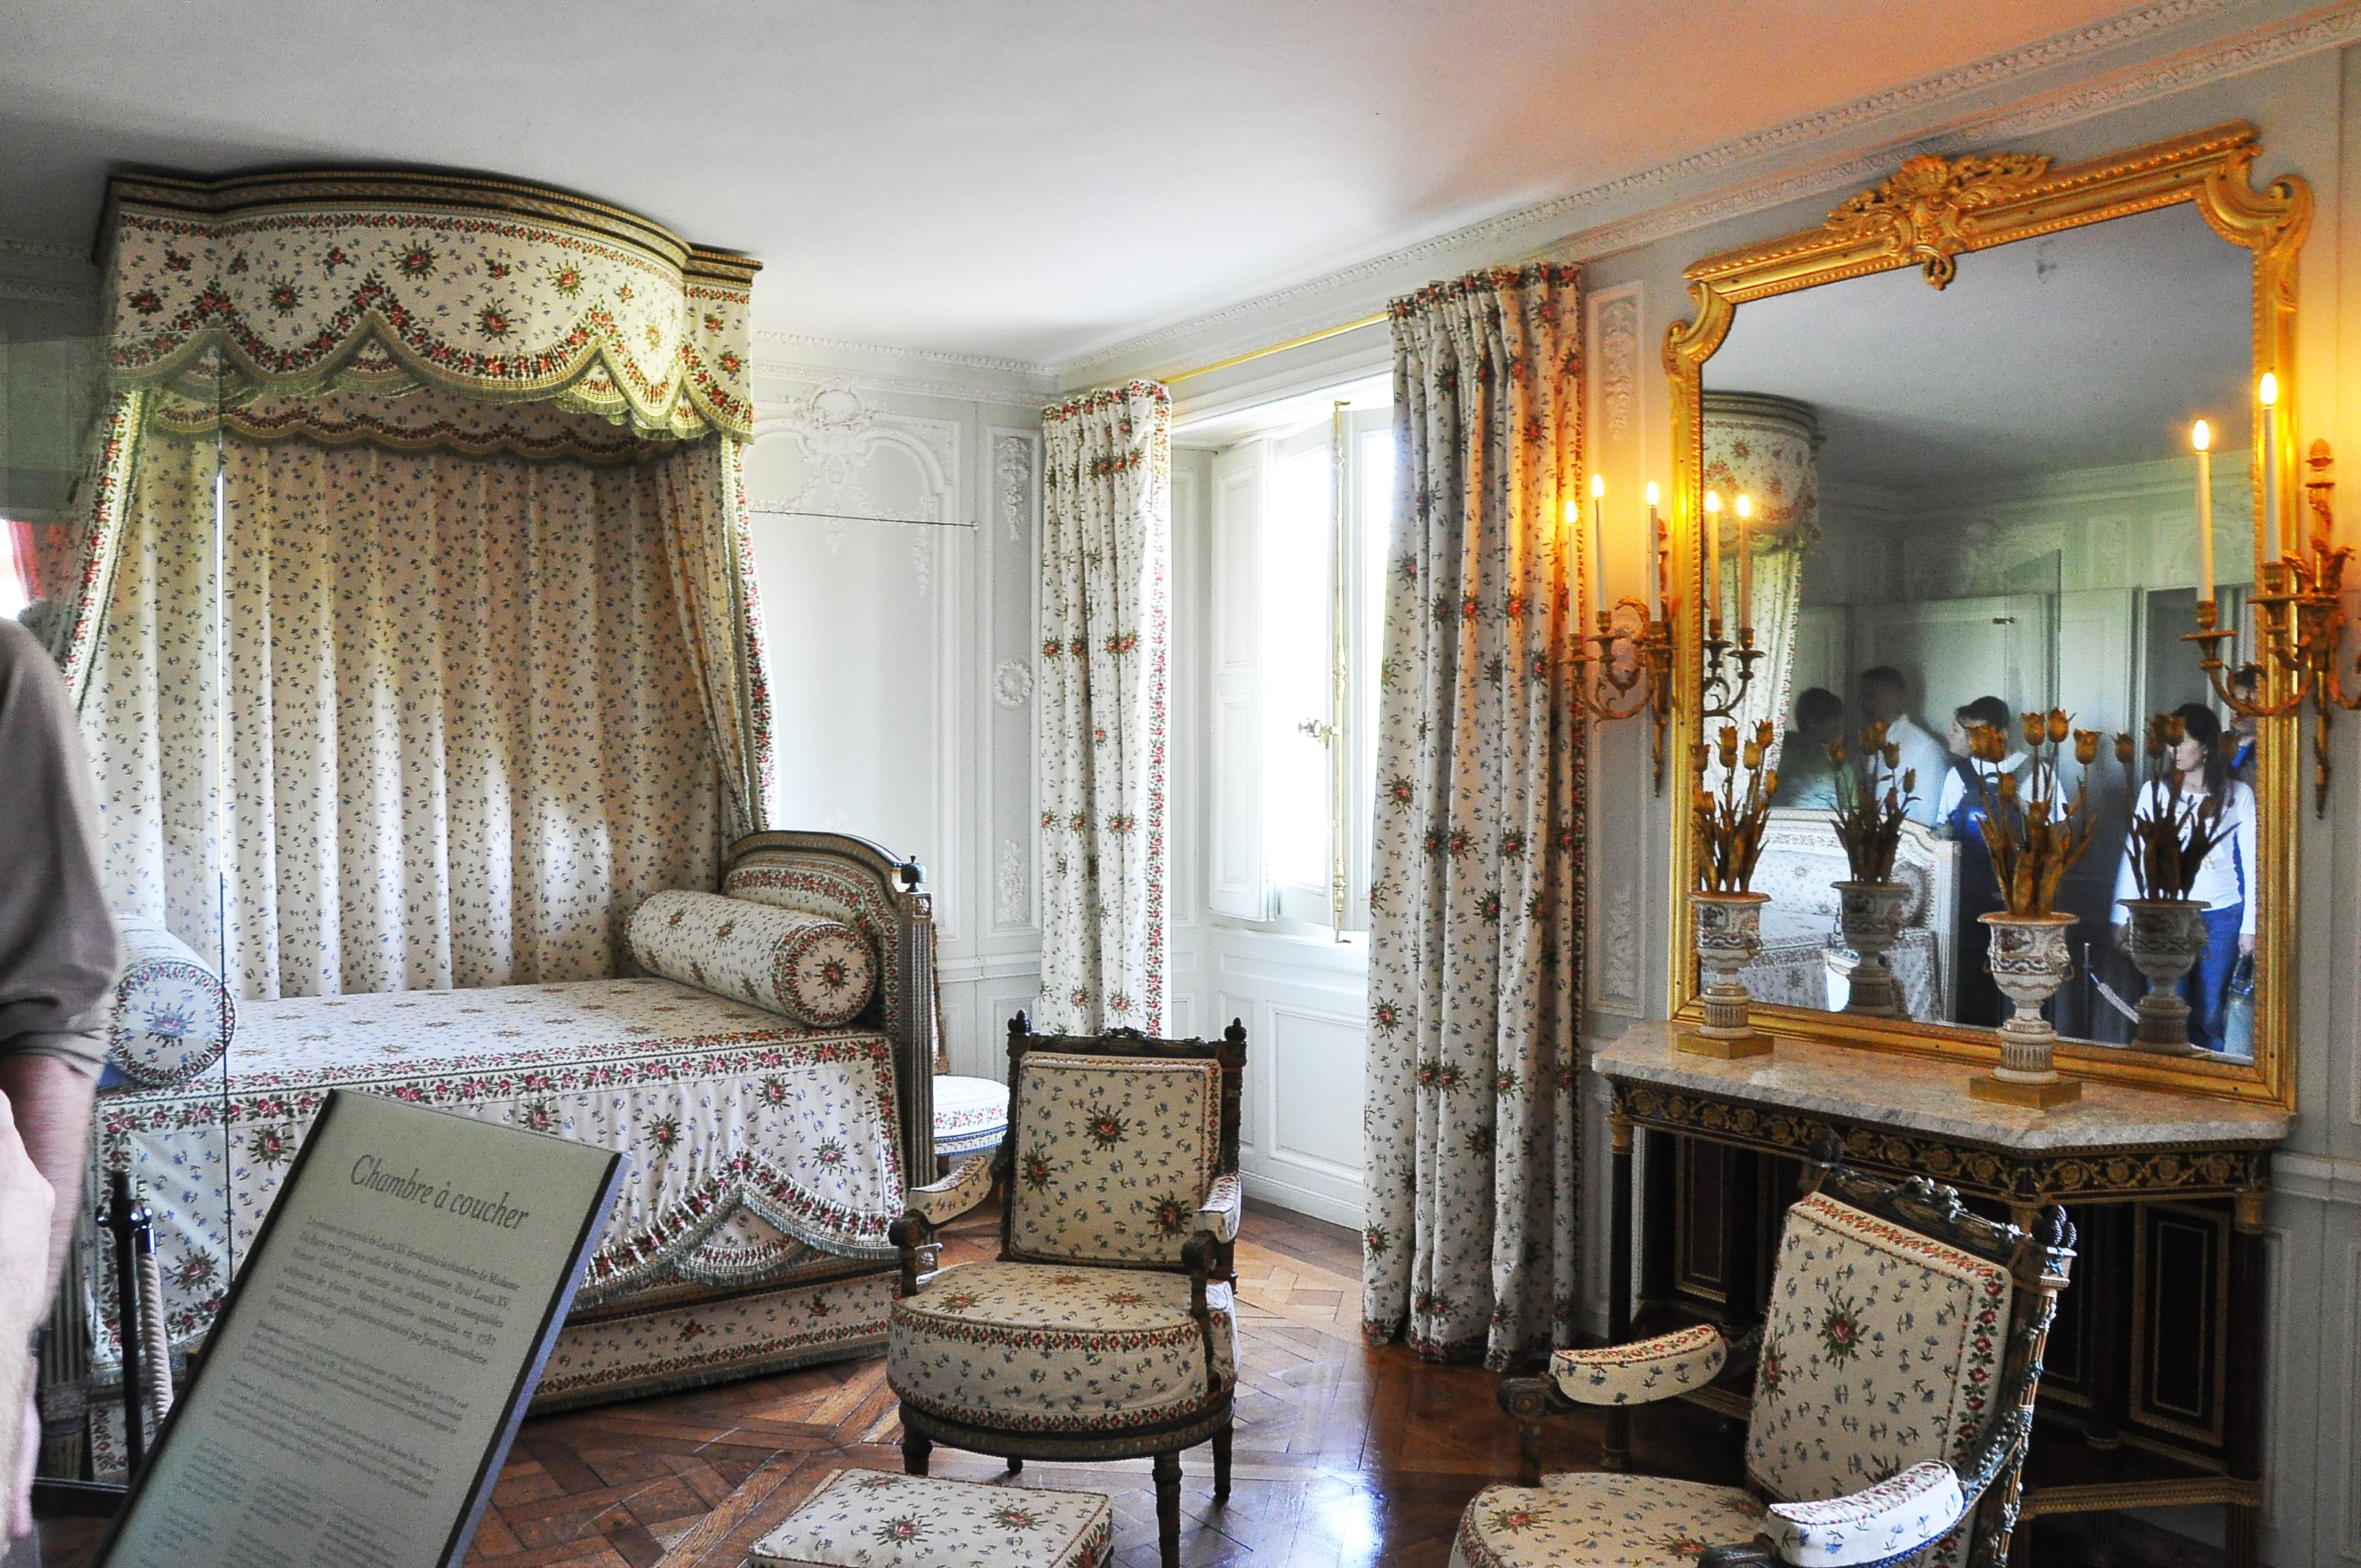 FileChambre de la Reine du Petit Trianon 004jpg  Wikipedia